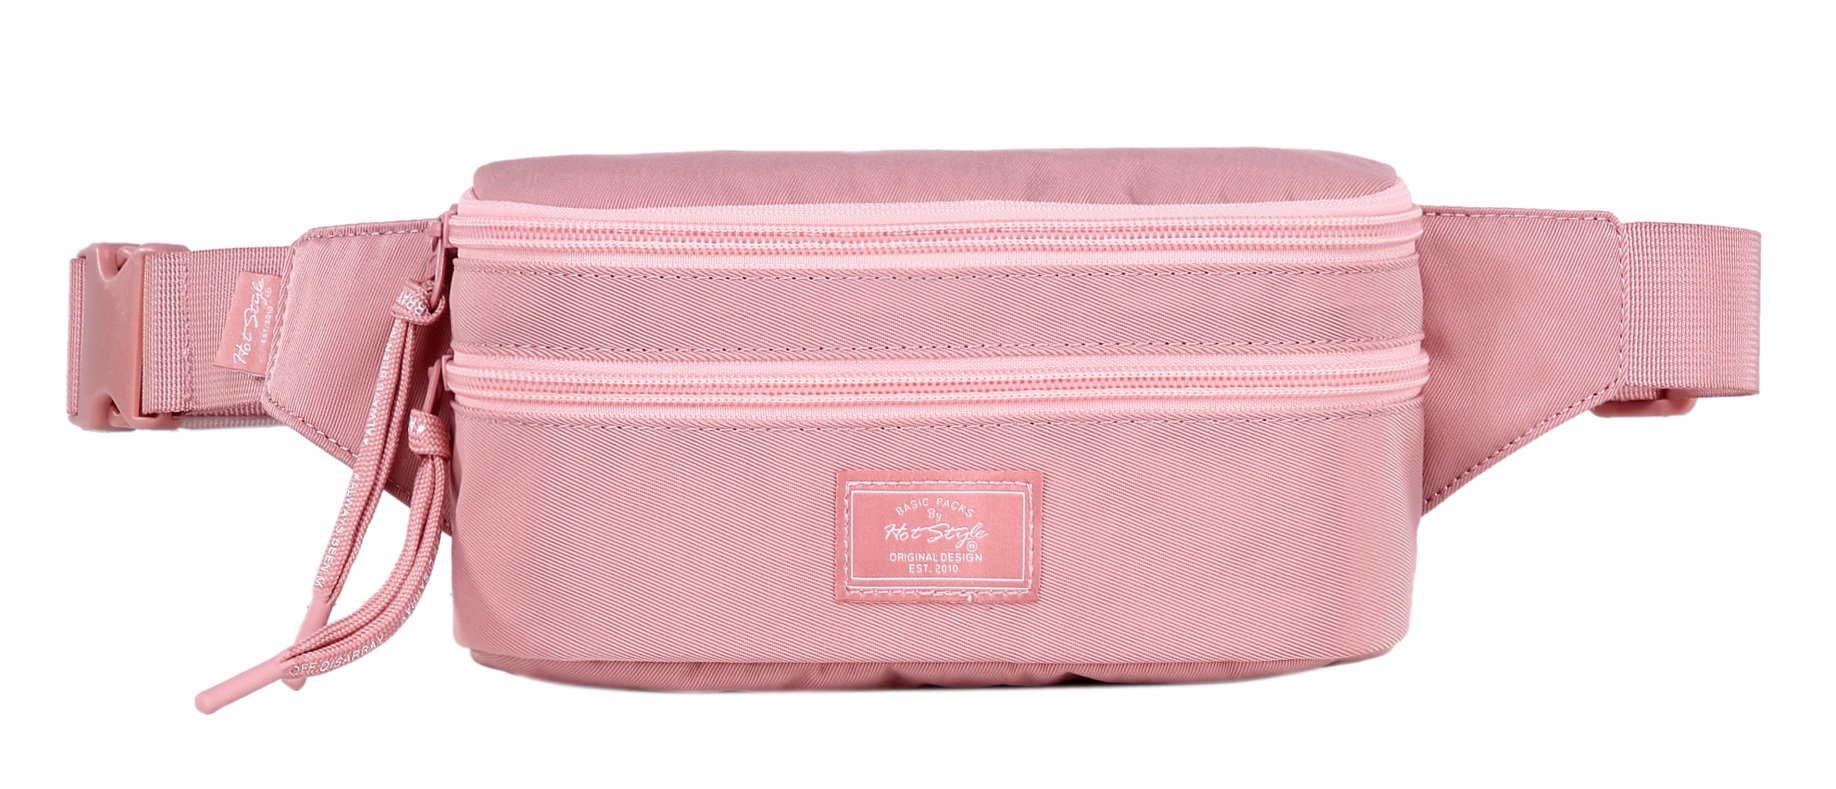 521s Fashion Waist Bag Cute Fanny Pack | 8.0''x2.5''x4.3'' | Millennial Pink